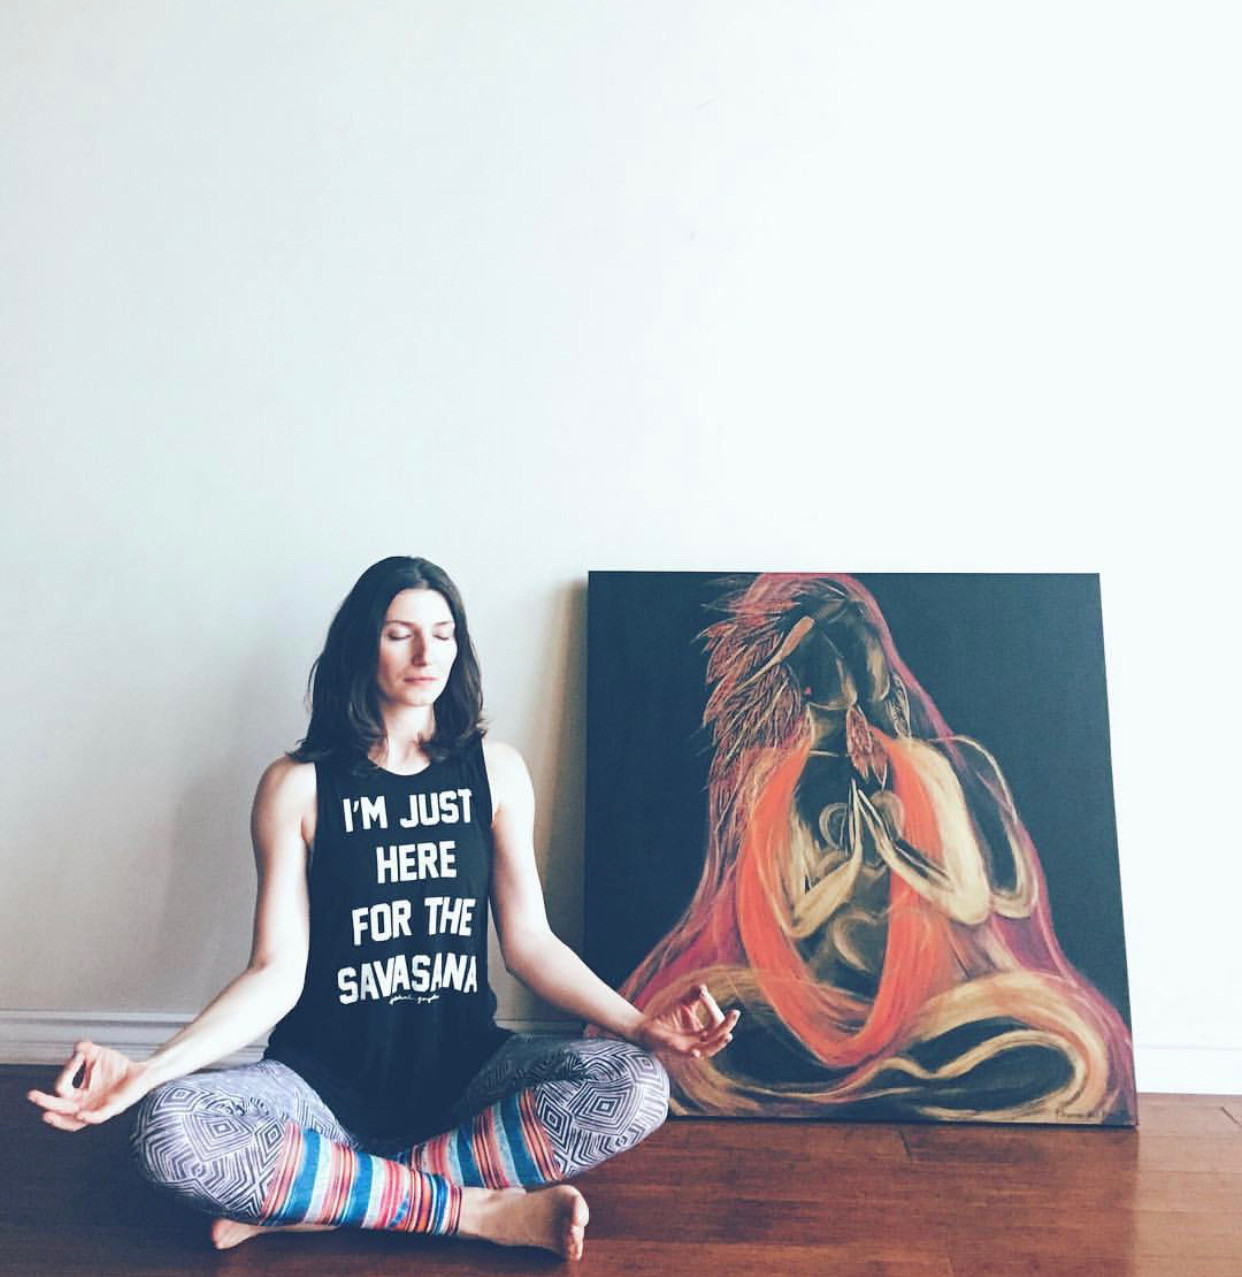 Spirit in Union with yogini Visnja